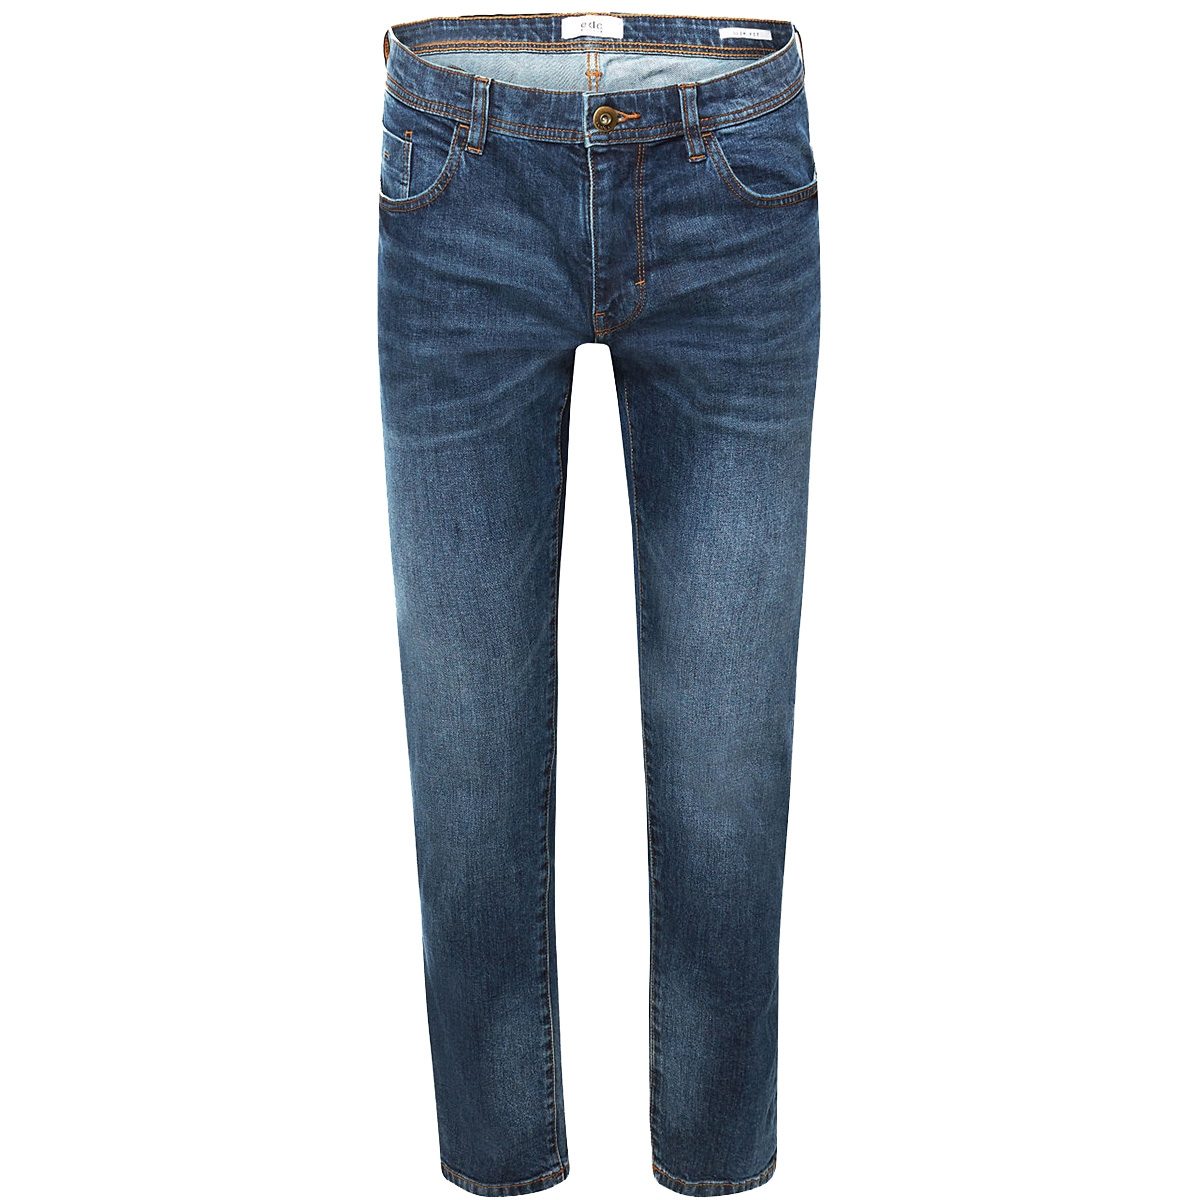 029cc2b004 edc jeans c901